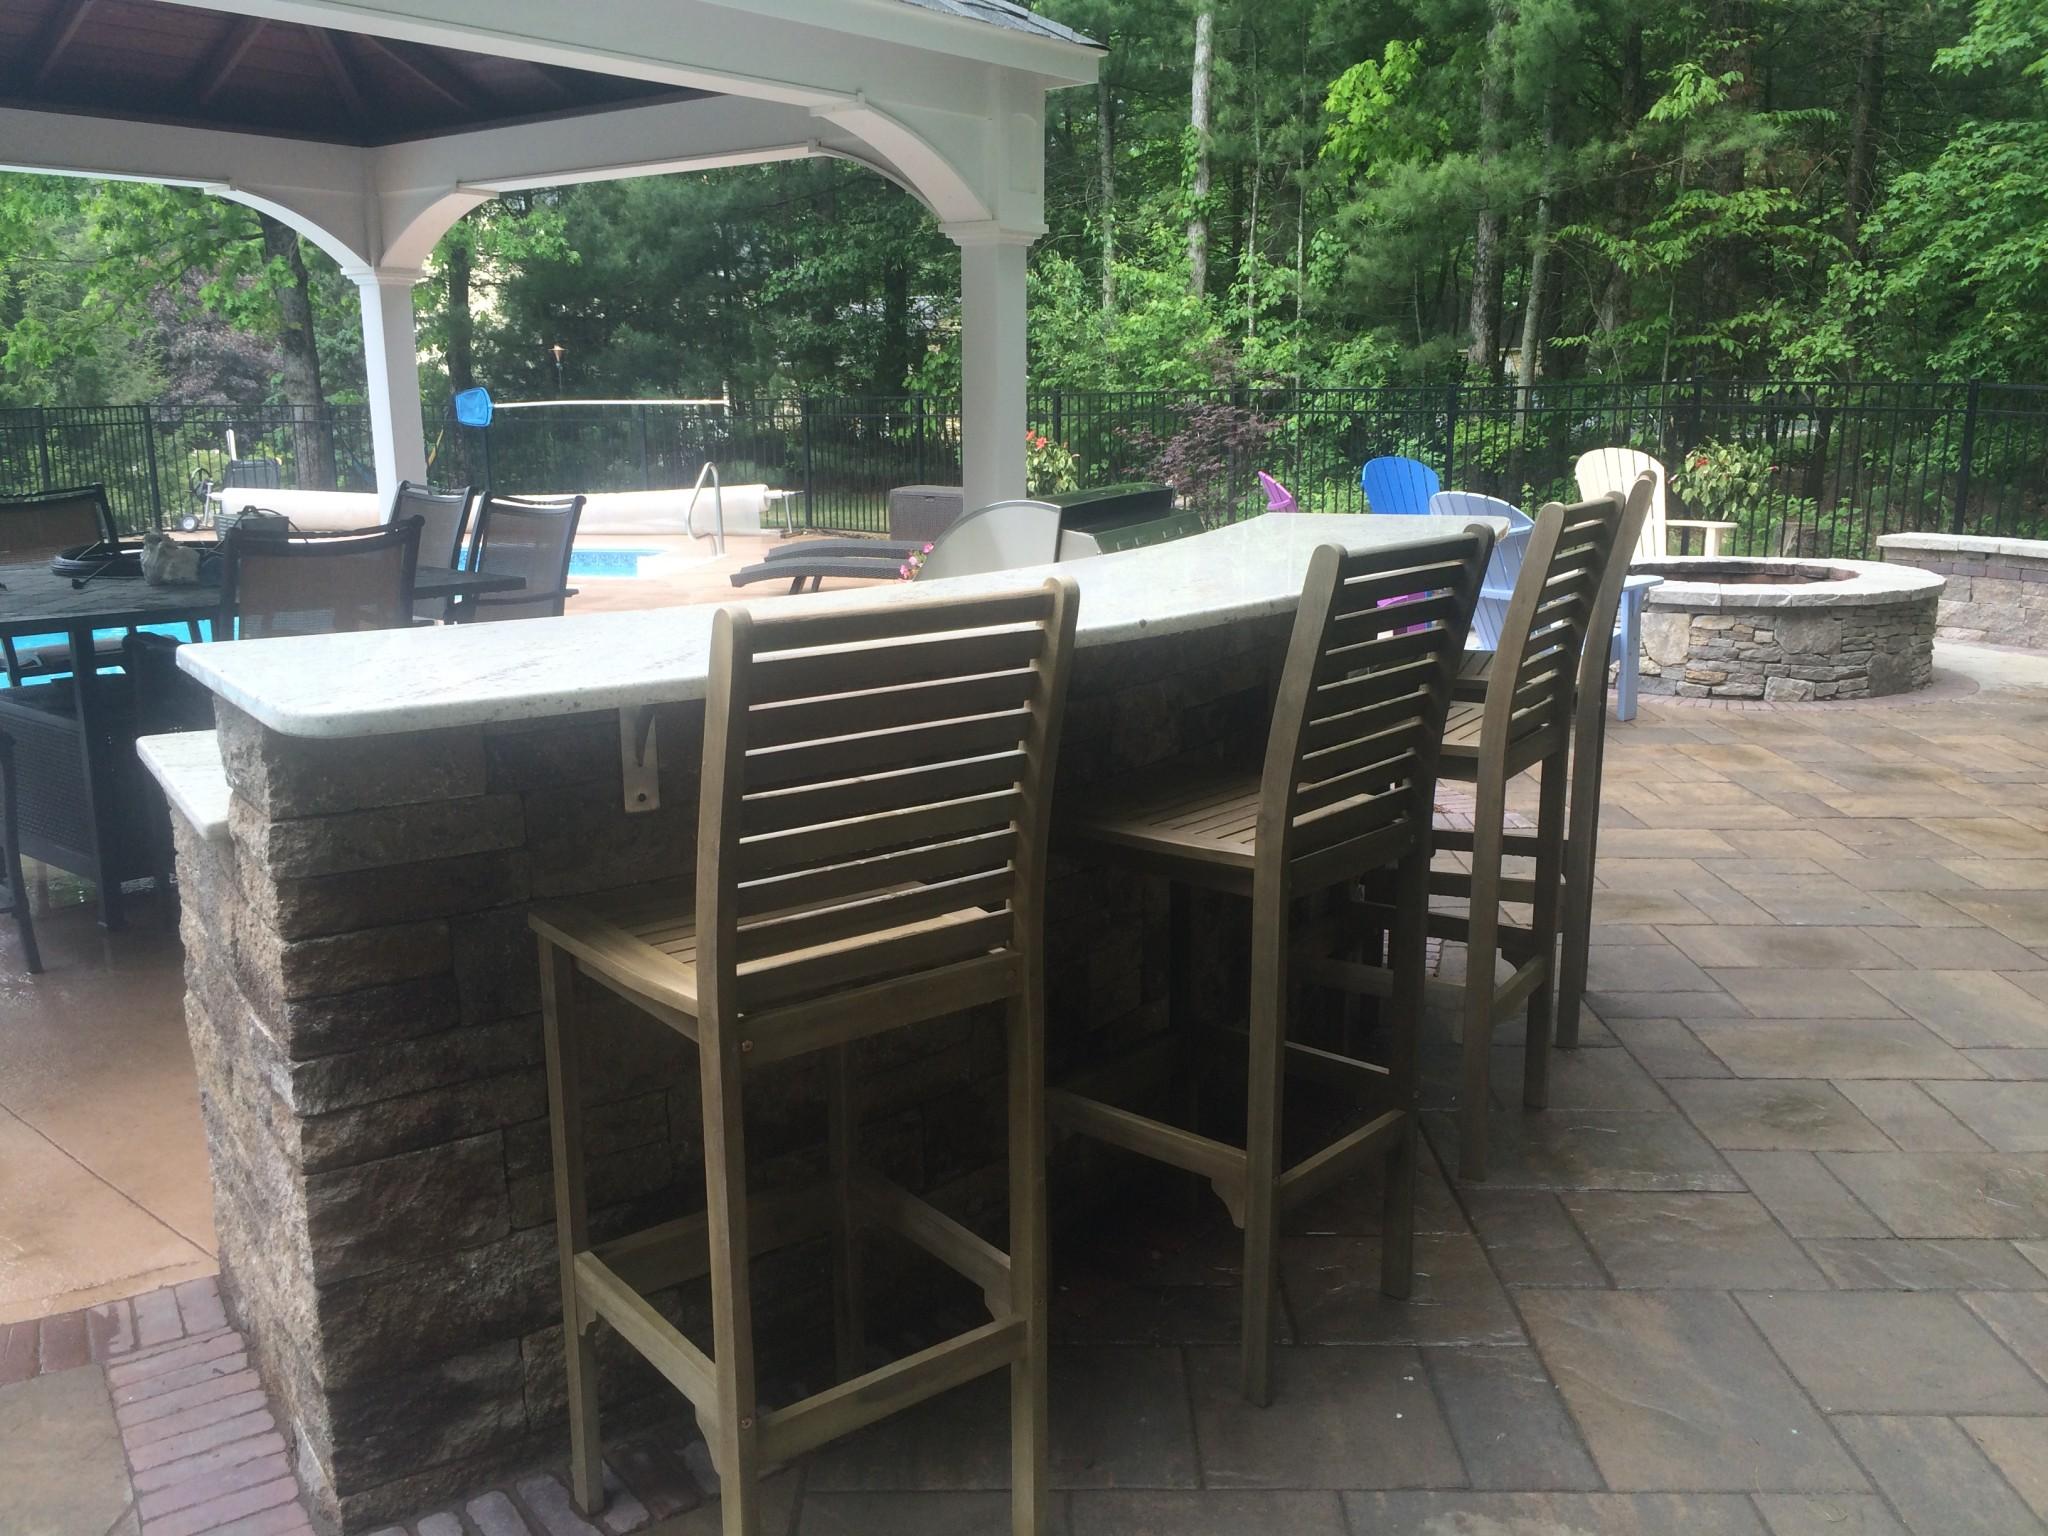 outdoor-kitchens_33045226185_o